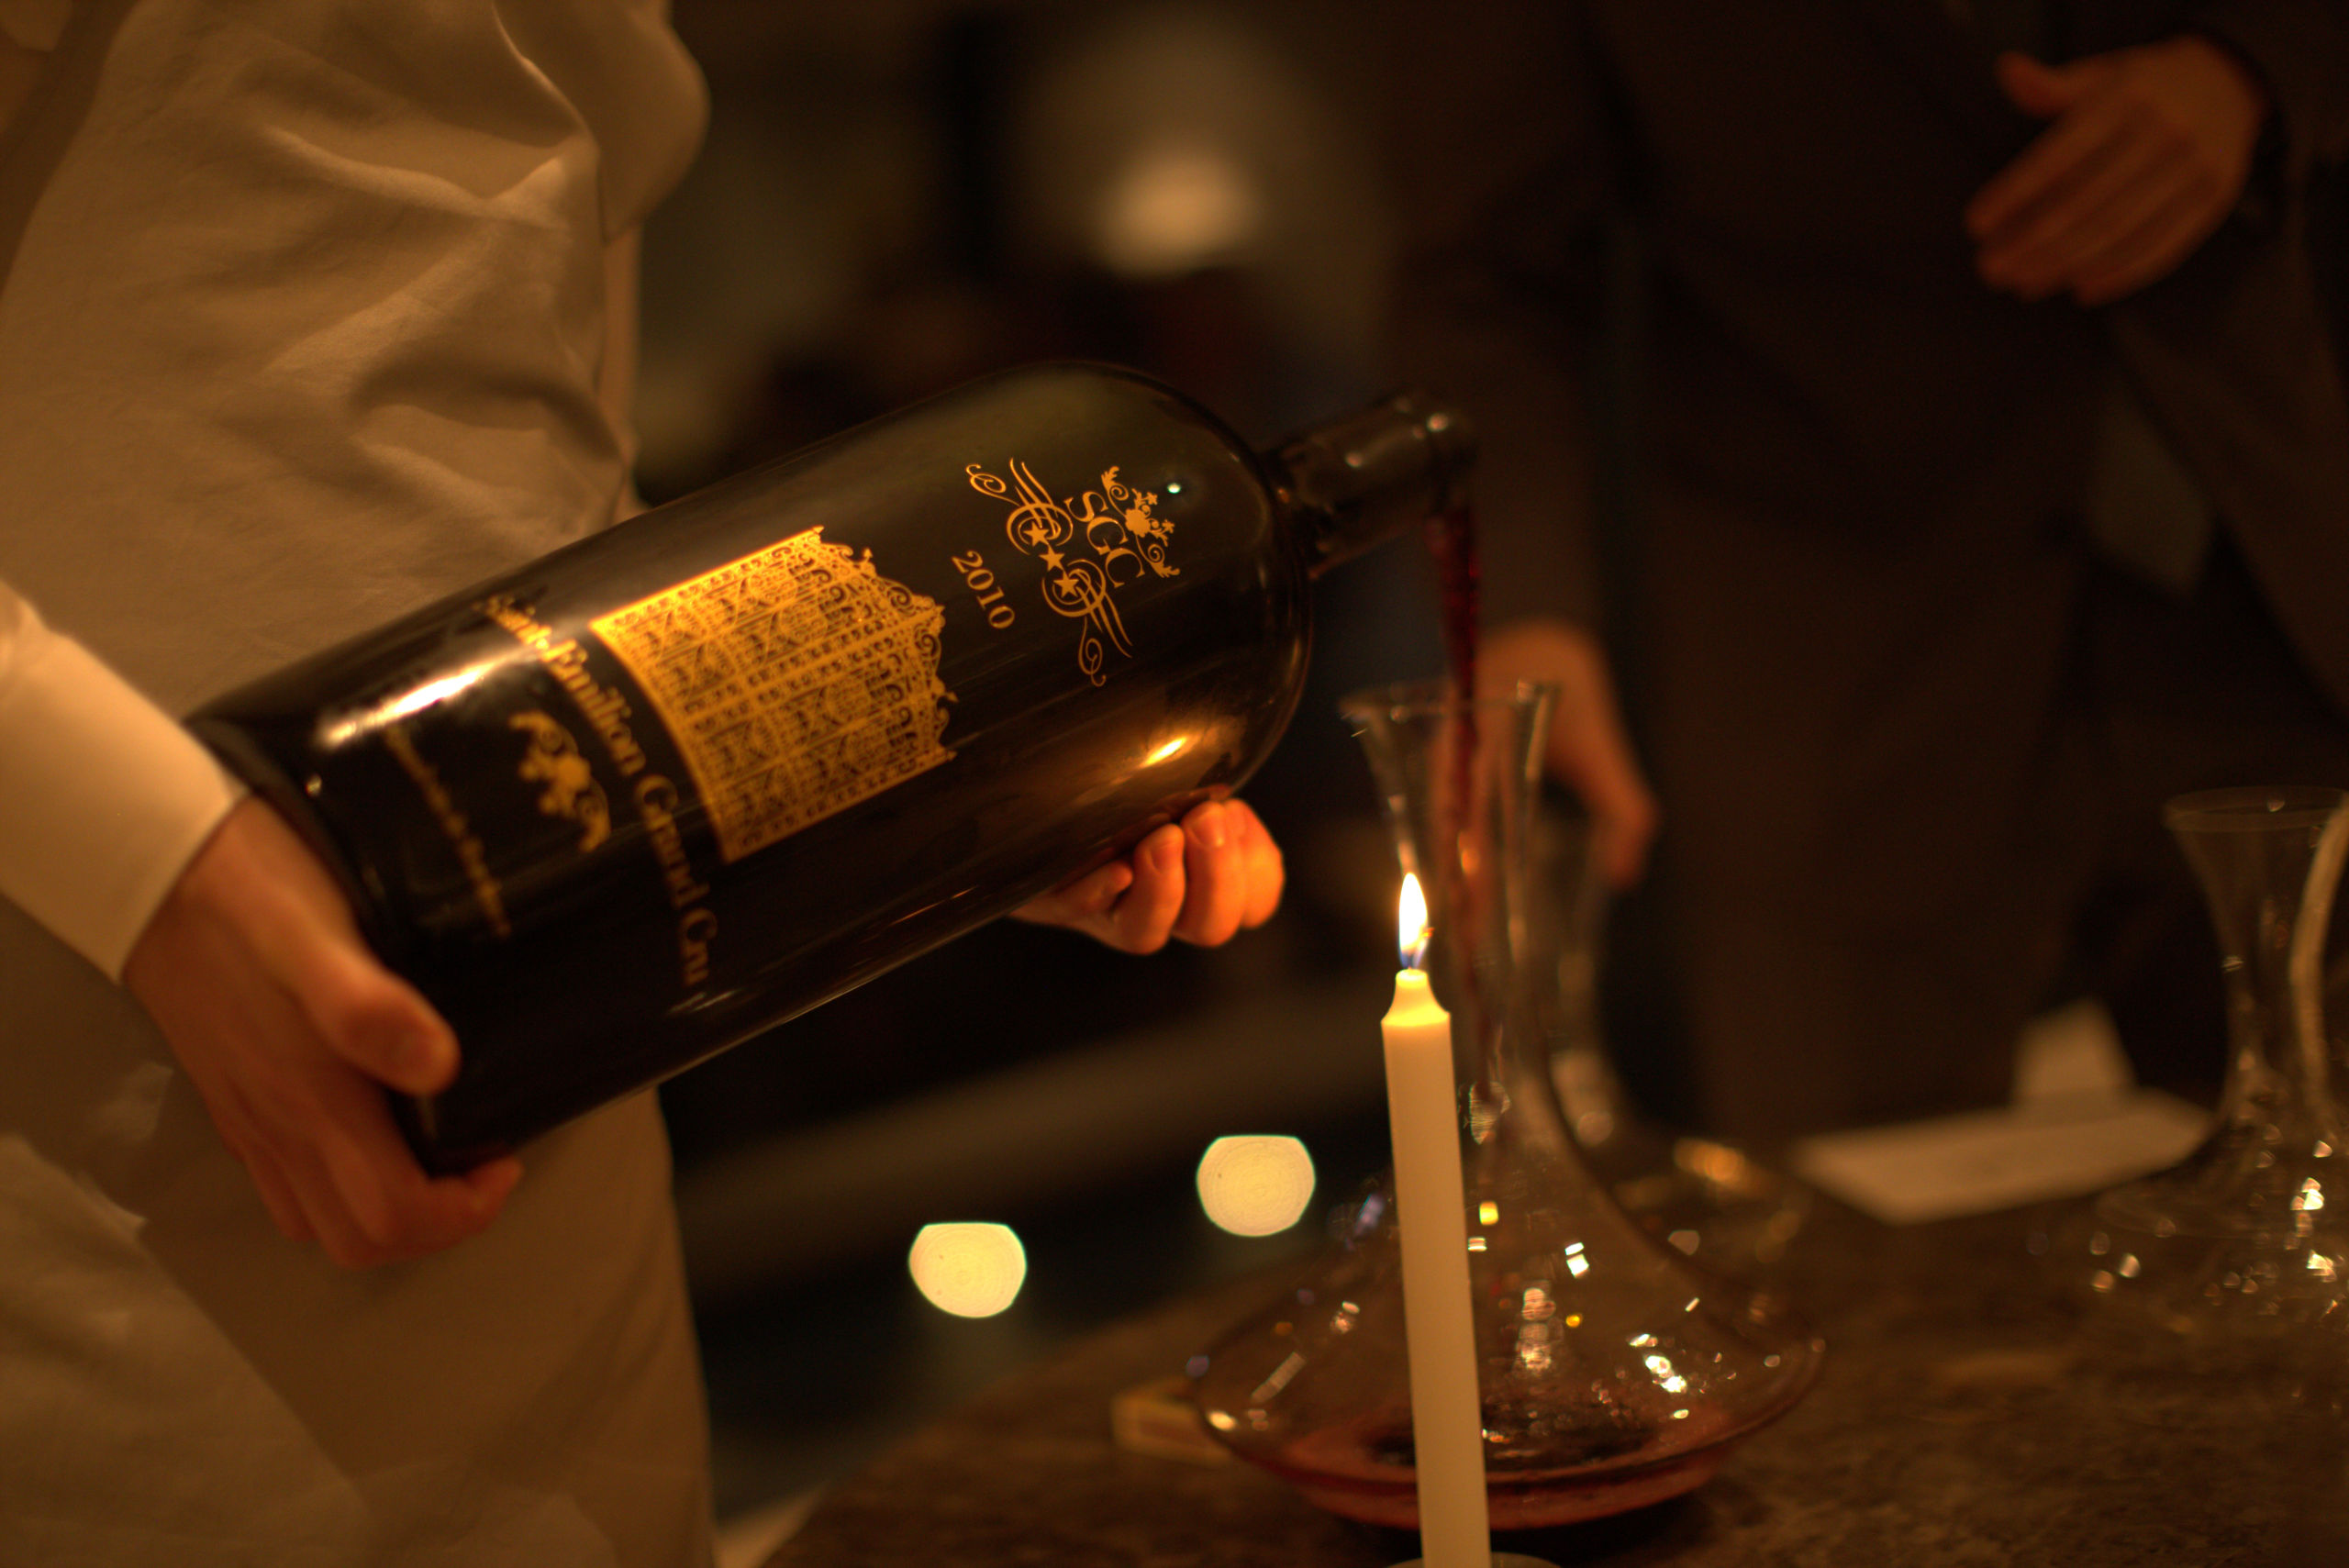 Decanting from SGC wine bottle - Bordeaux